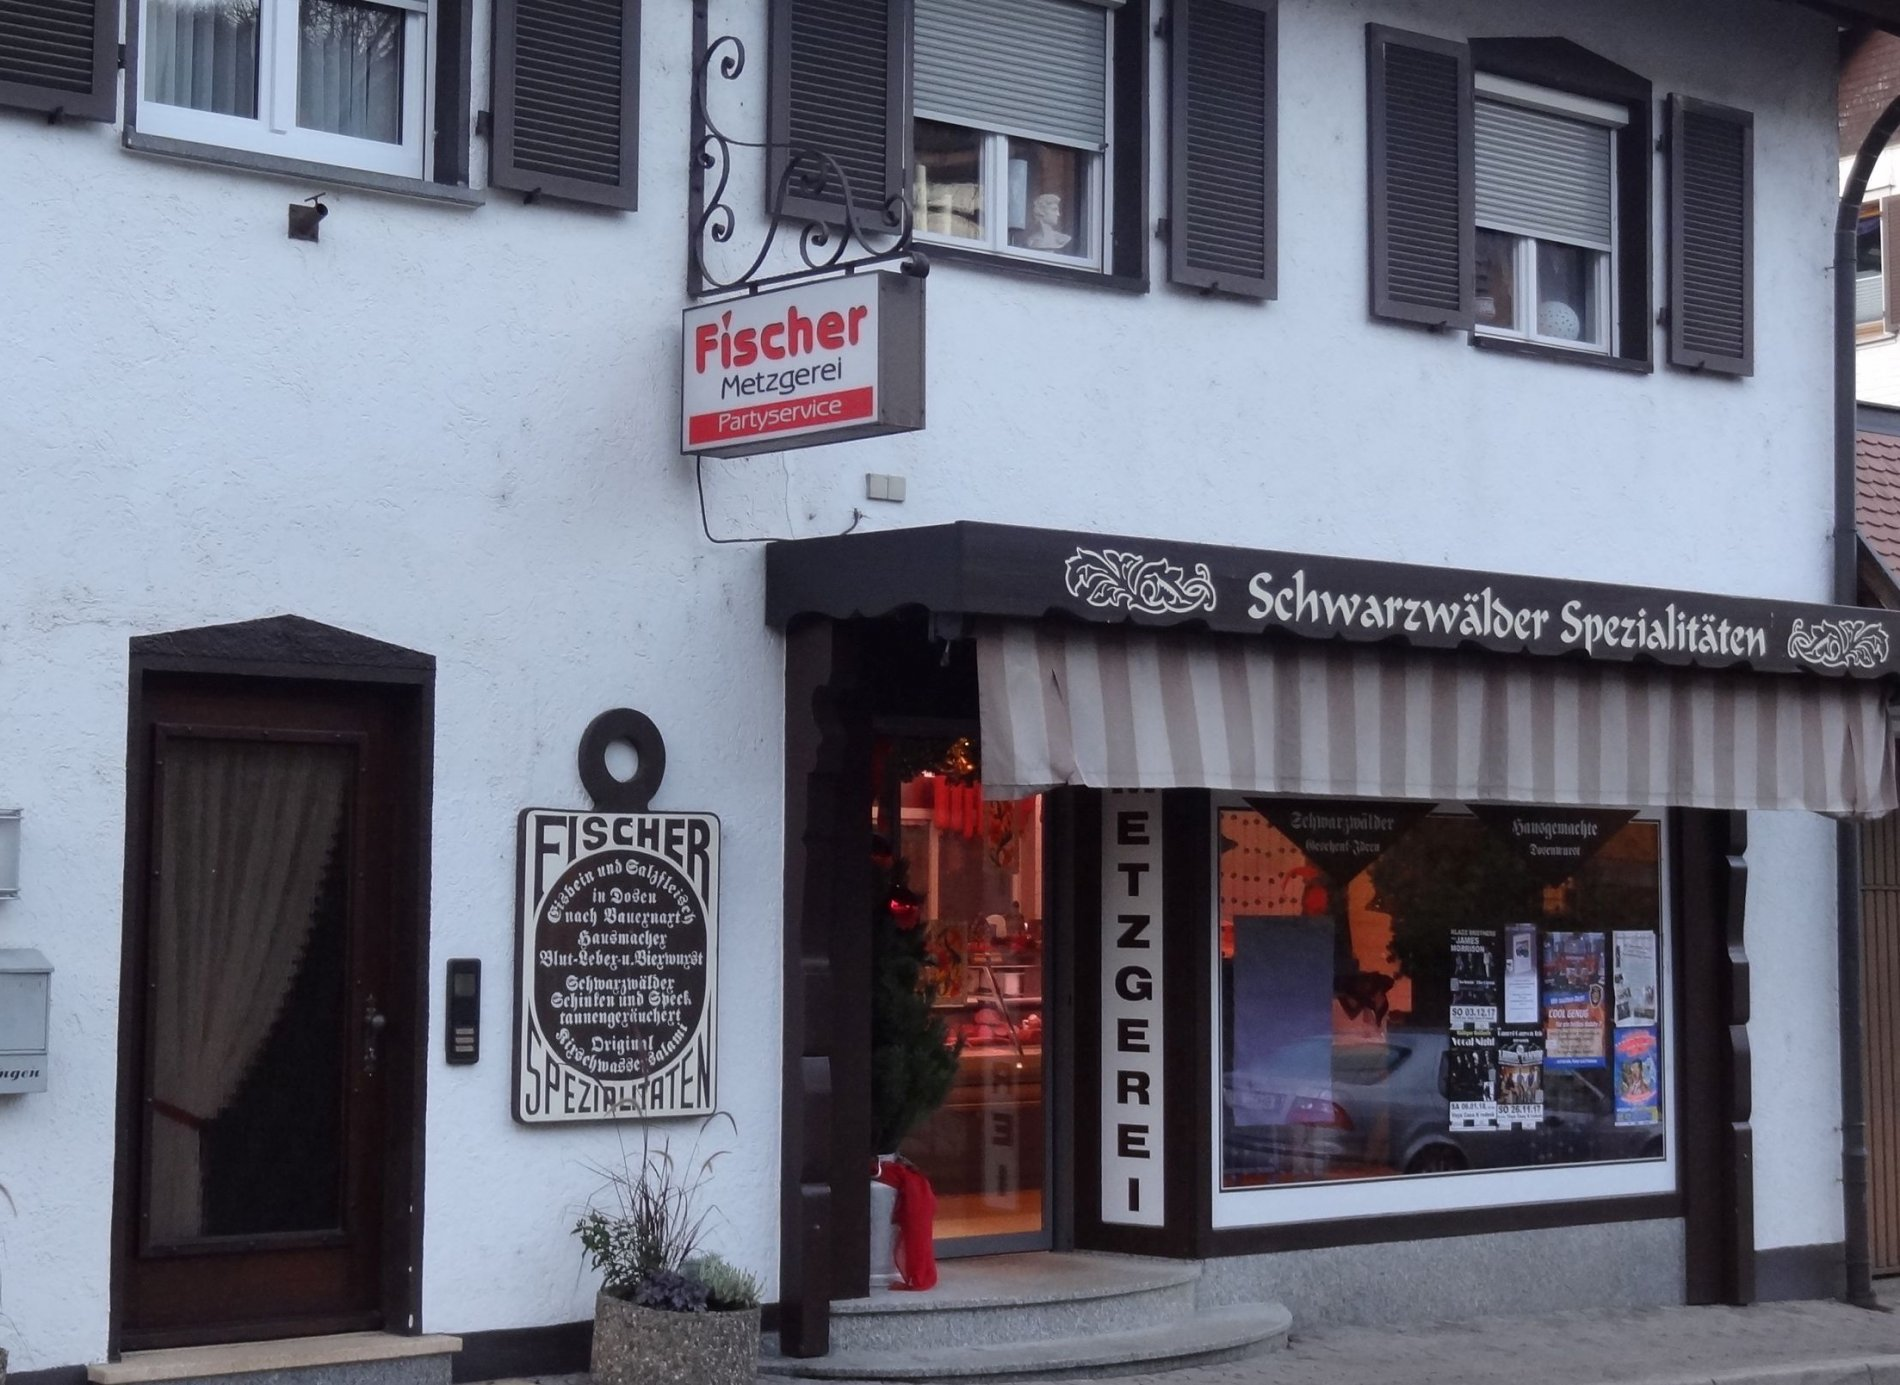 Metzgerei Fischer in Seebach